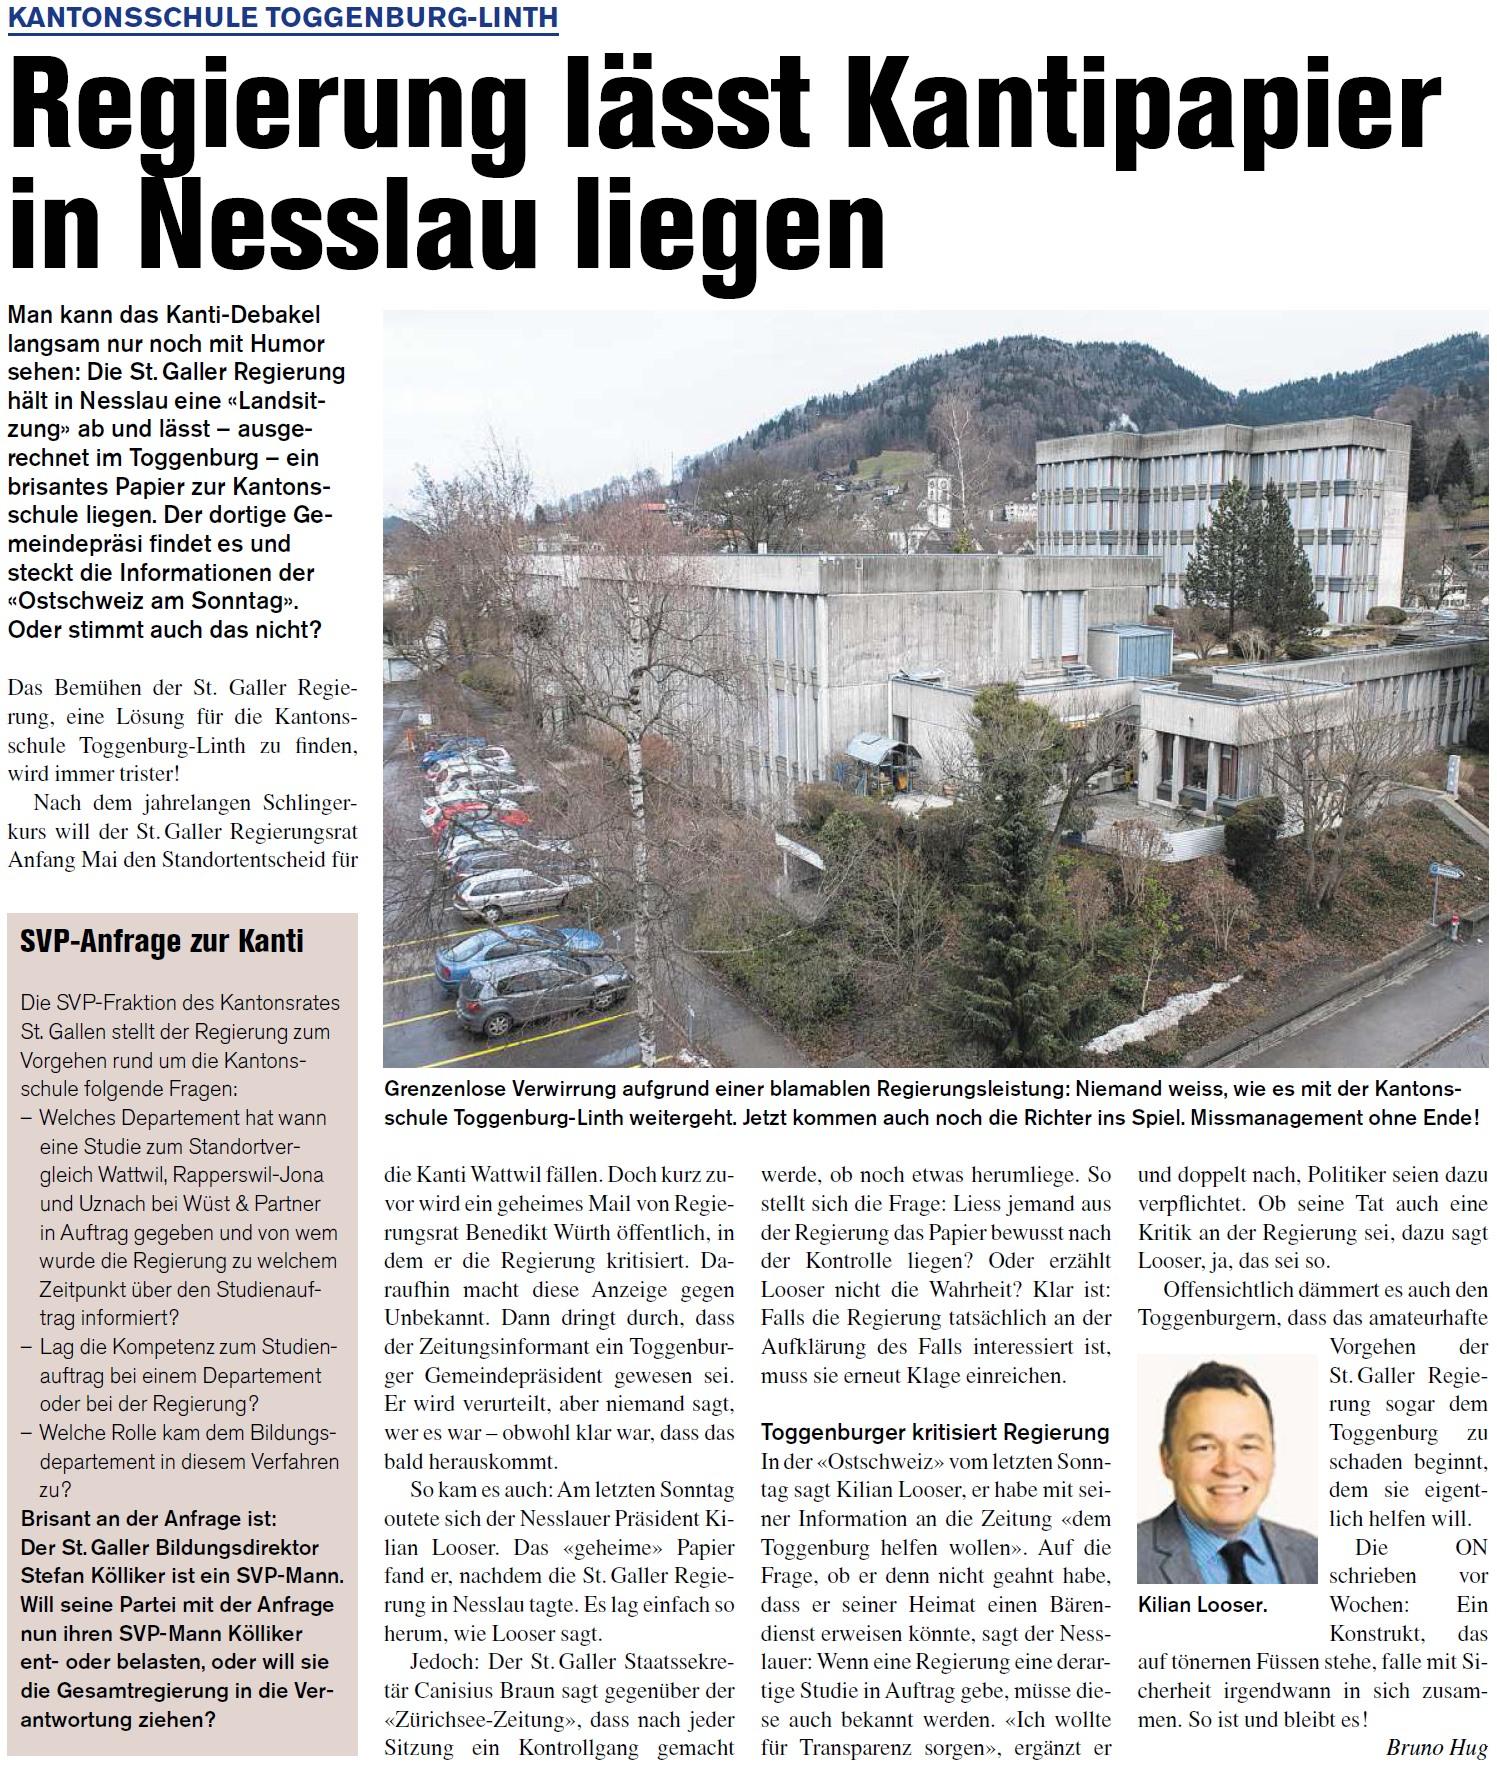 Regierung lässt Kantipapier in Nesslau liegen (Donnerstag, 07.08.2014)